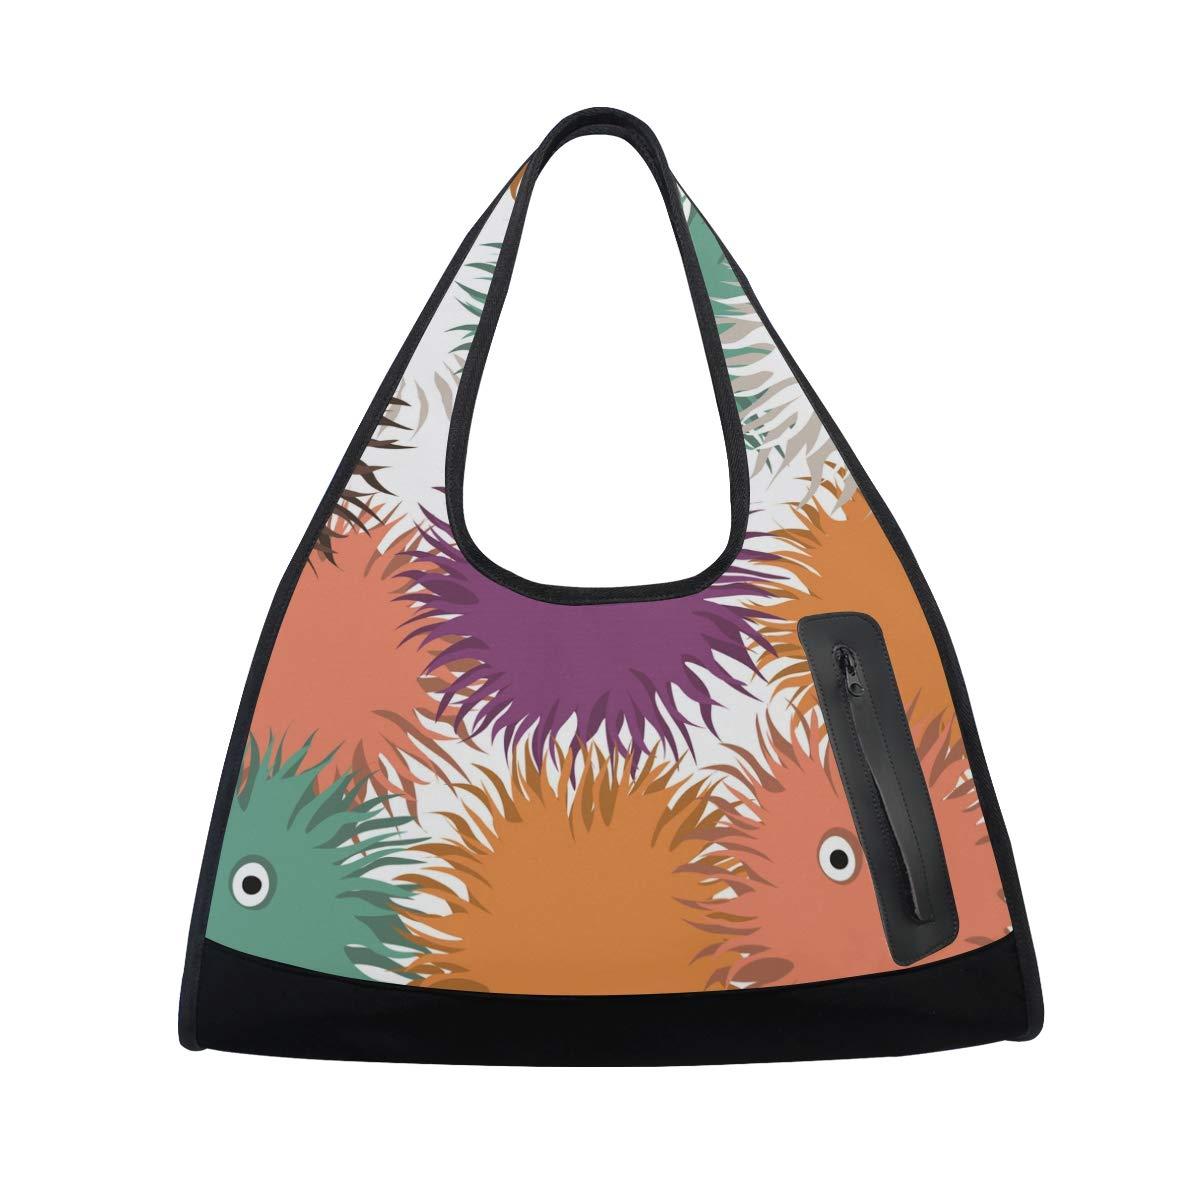 Unisex Travel Duffels Gym Bag Cartoon Fluffy Round Canvas Weekender Bag Shoulder Bag Totes bags